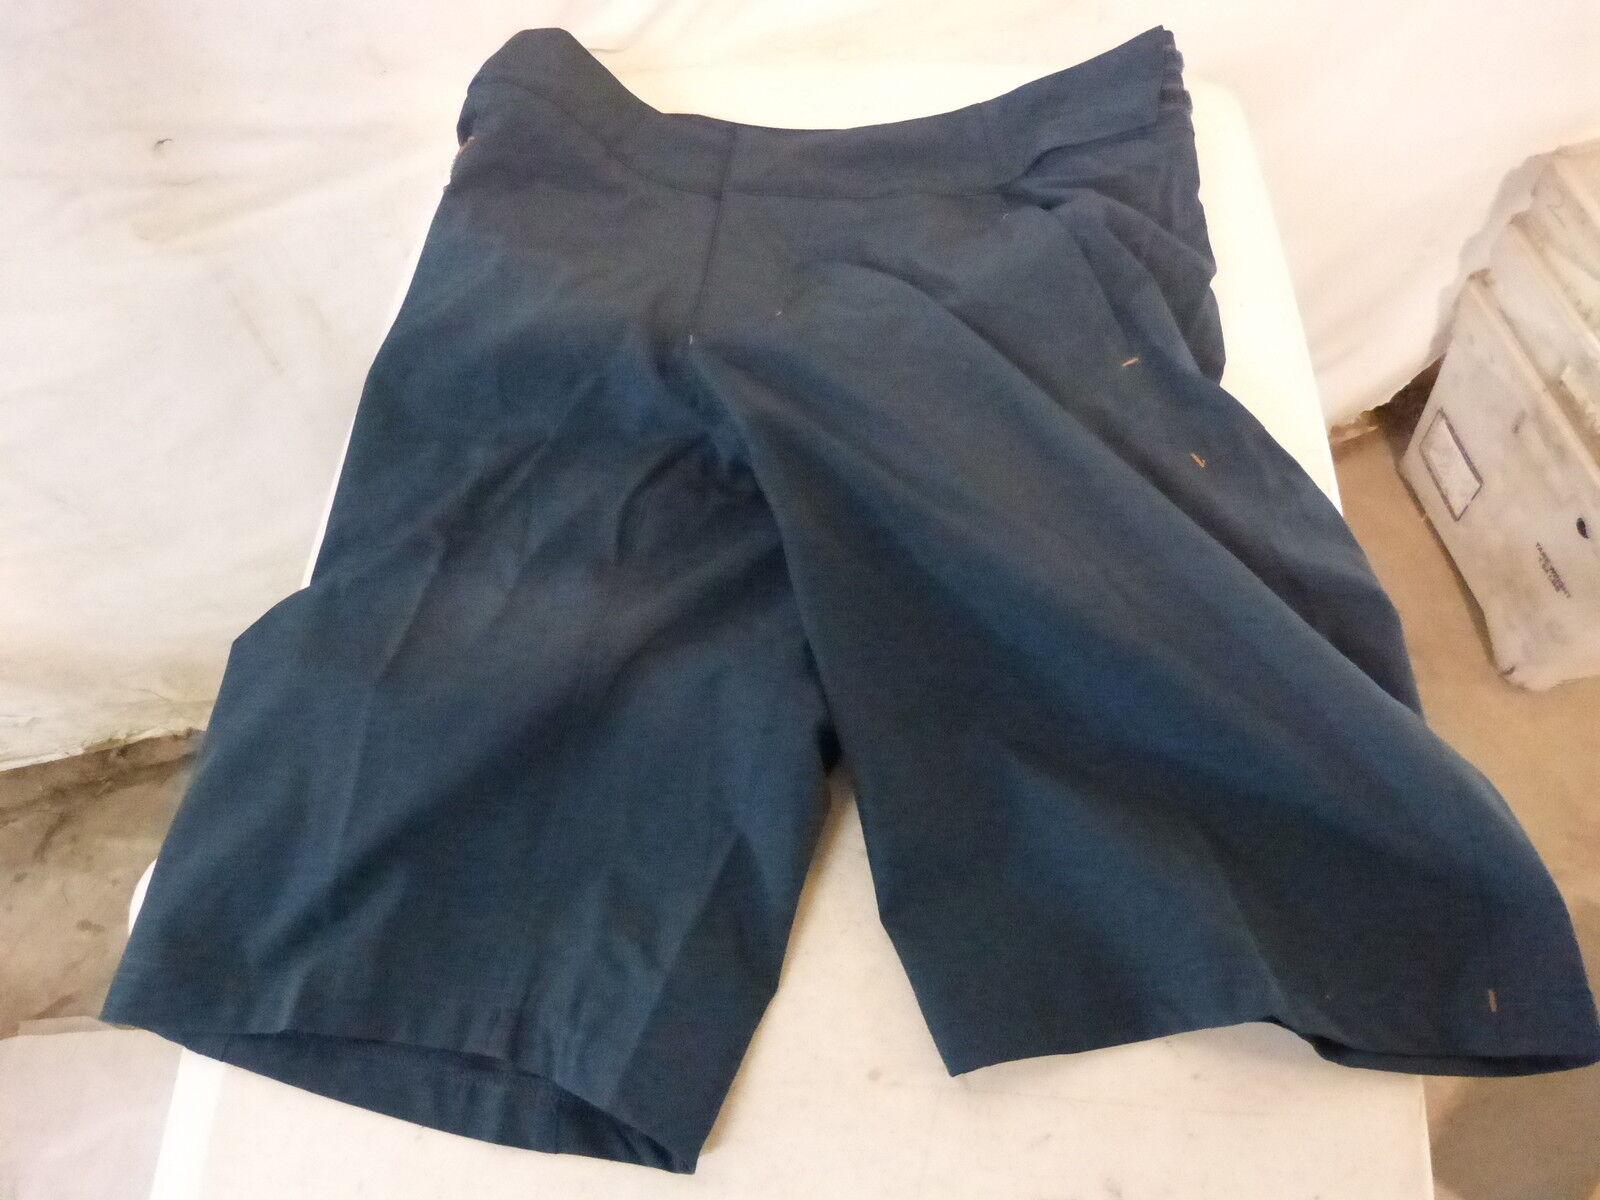 Louis Garneau Leeway Cycling Short Men's XS Midnight bluee Retail  79.99